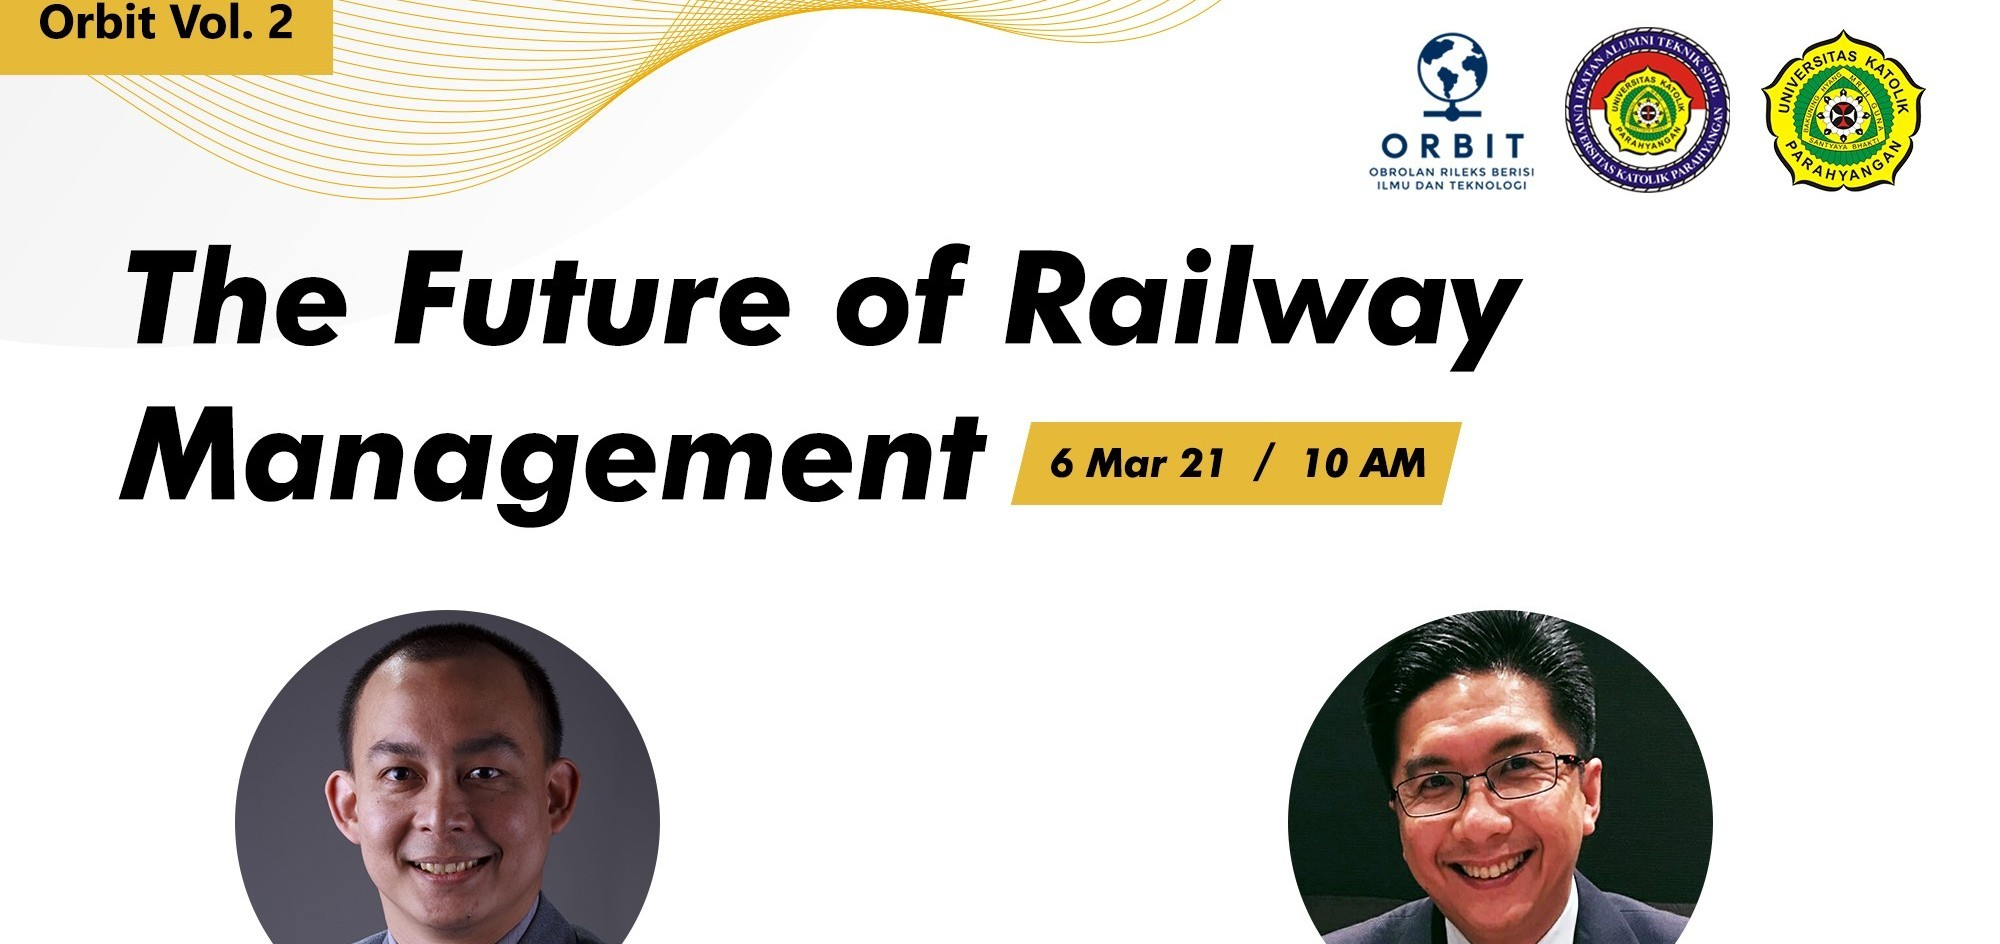 Orbit Vol#2 : The Future of Railway Management